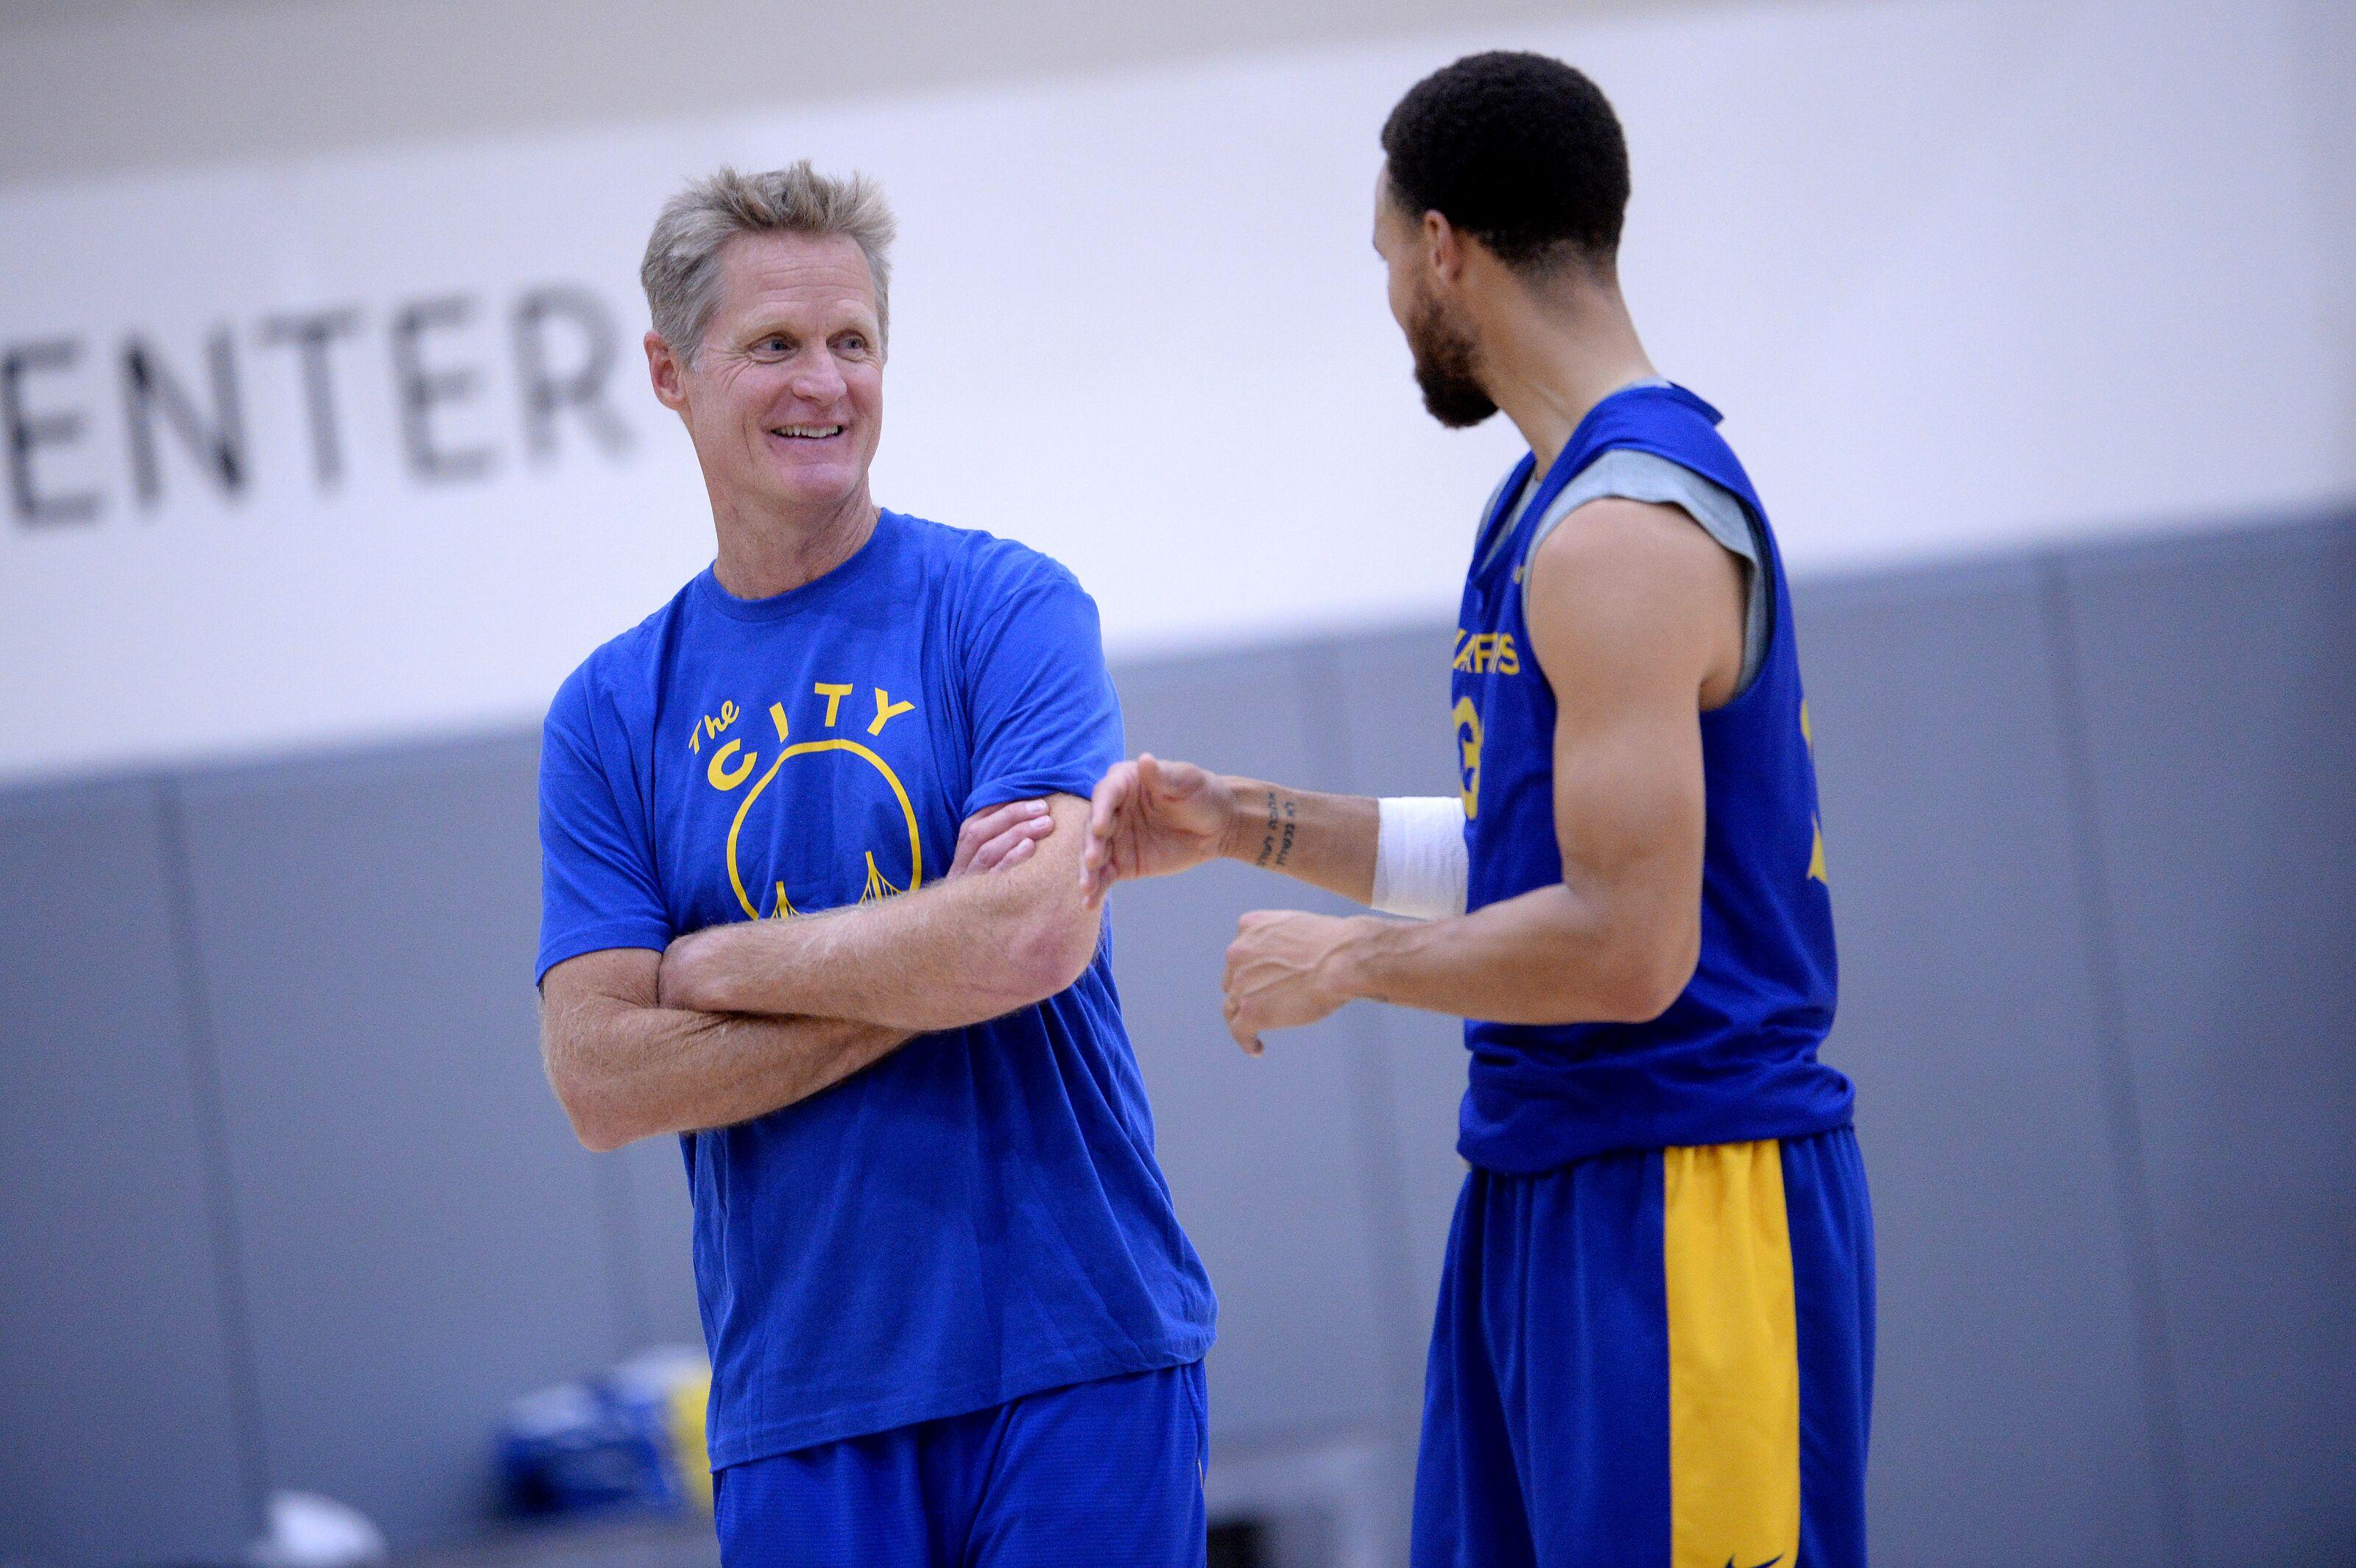 Golden State Warriors: The new era of Steve Kerr basketball